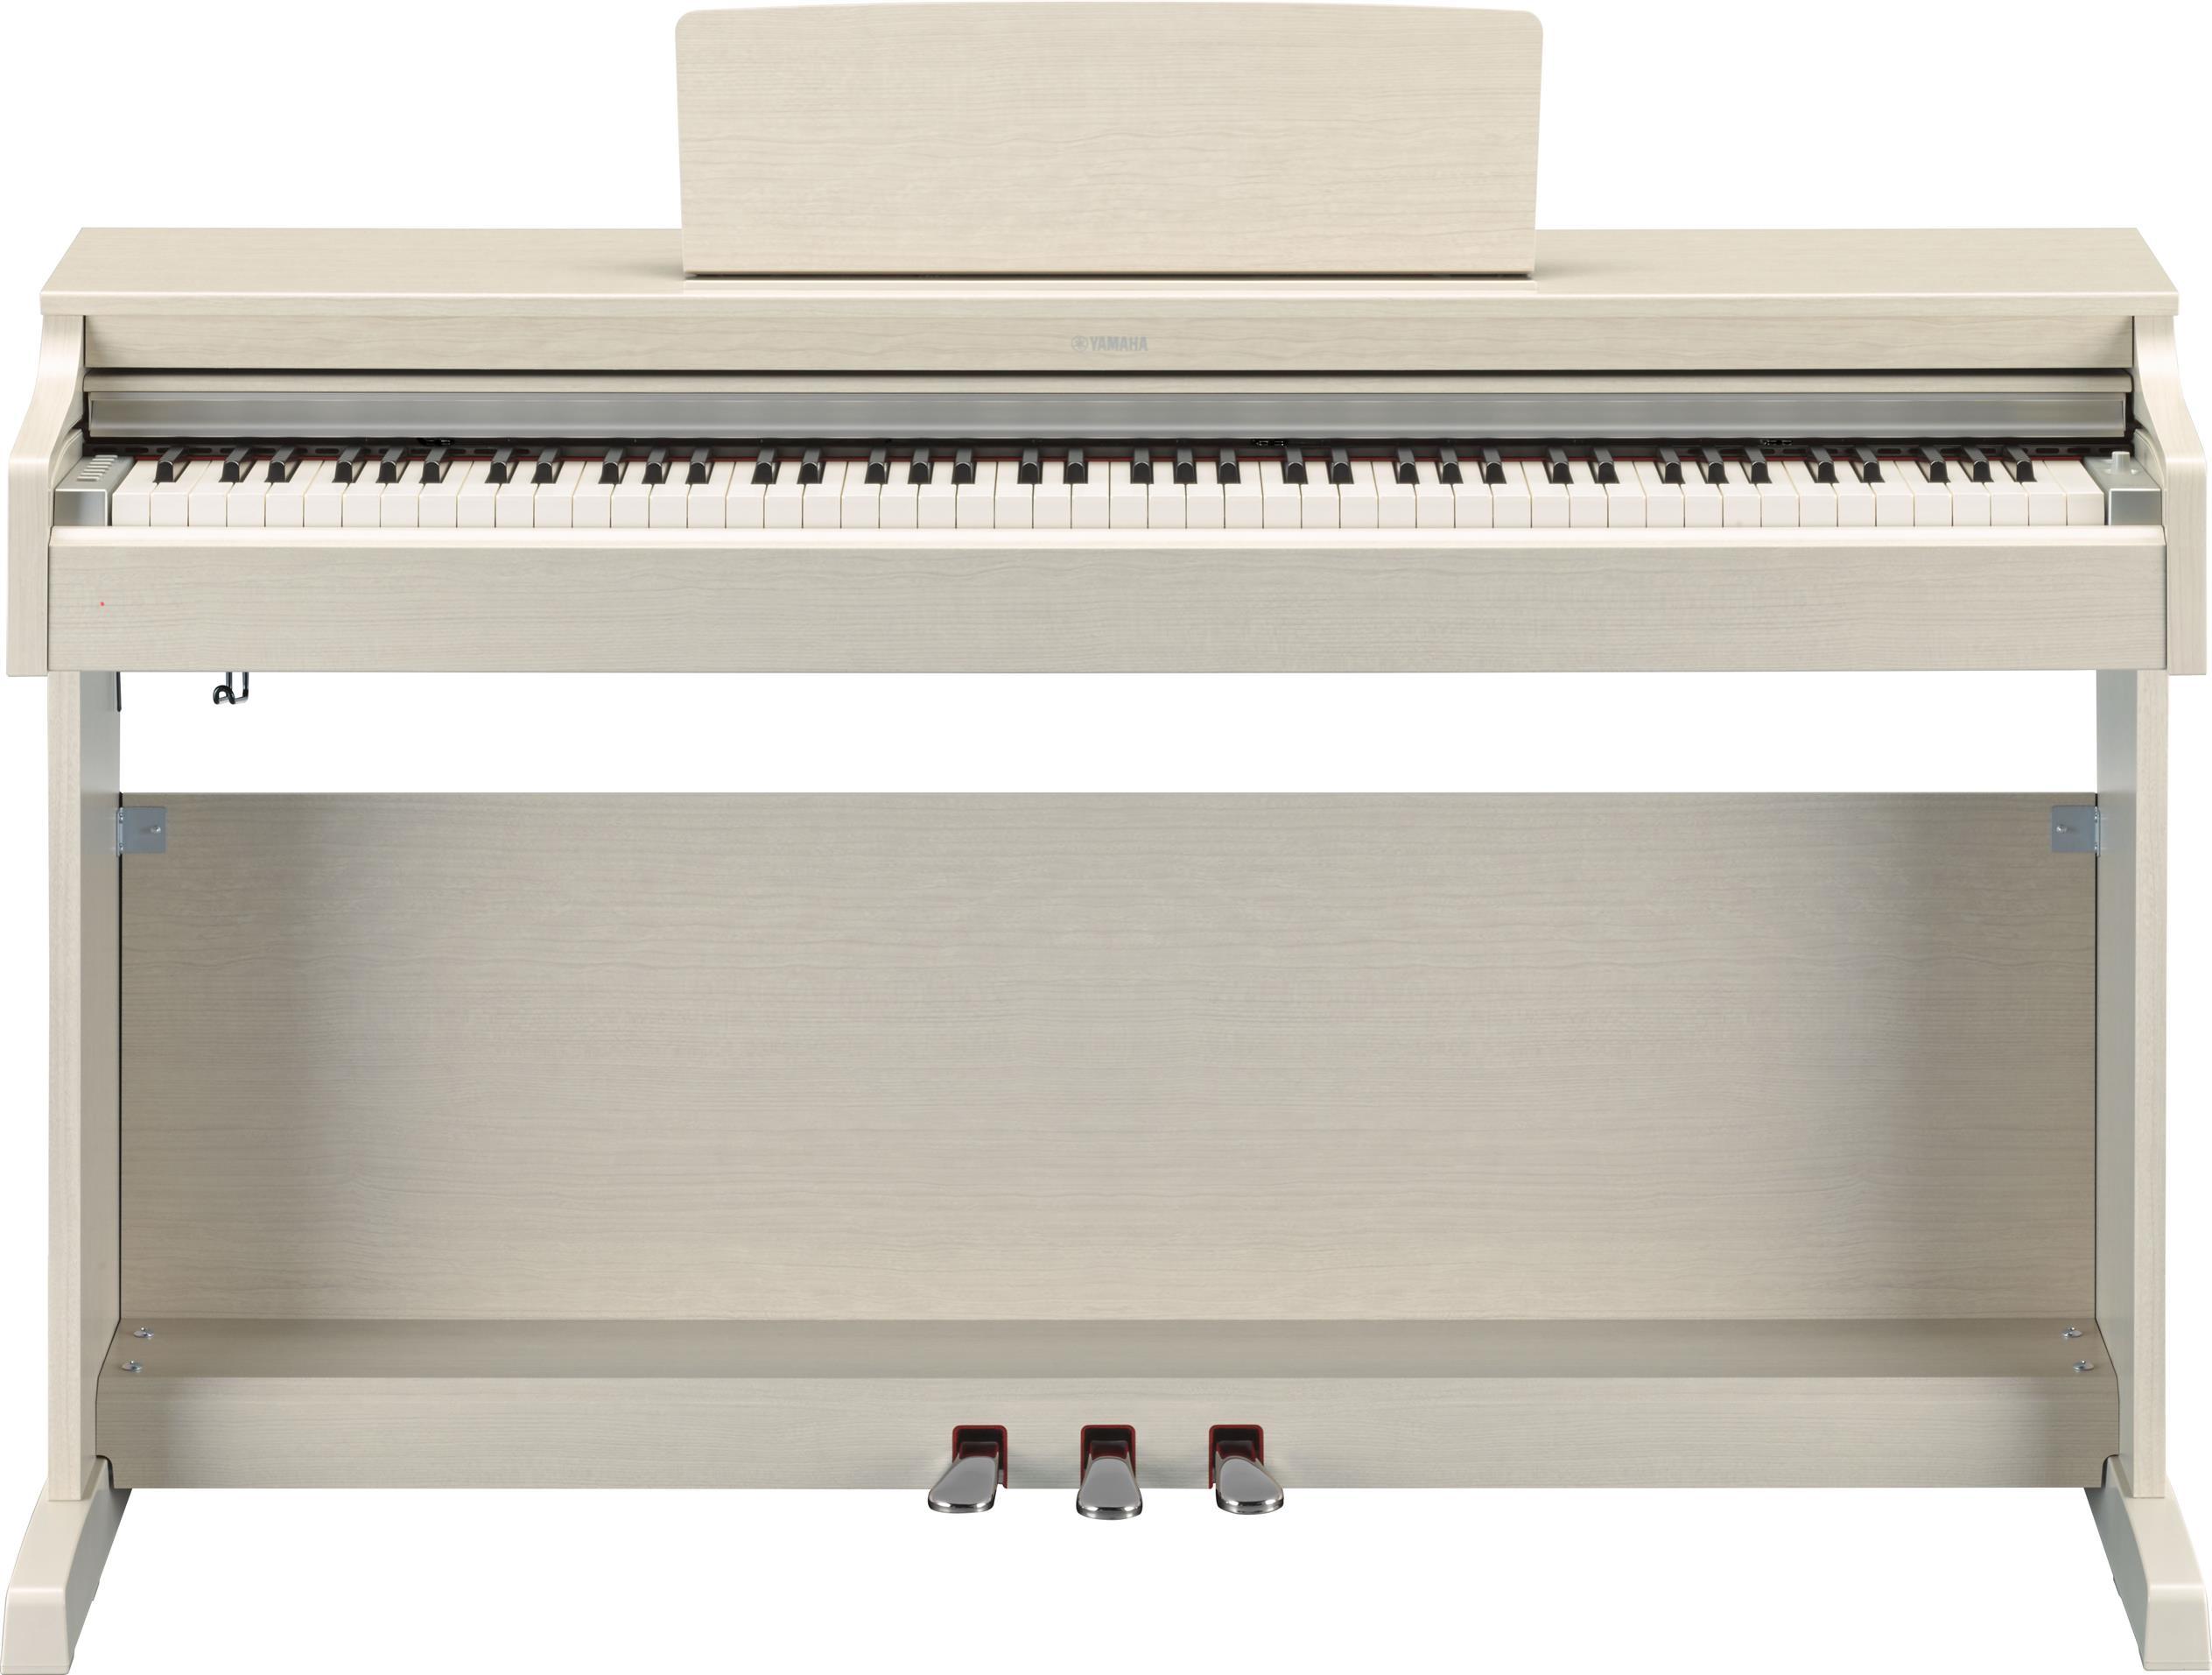 Digital Piano Free : yamaha arius ydp 163 88 key digita end 5 28 2020 1 15 pm ~ Vivirlamusica.com Haus und Dekorationen